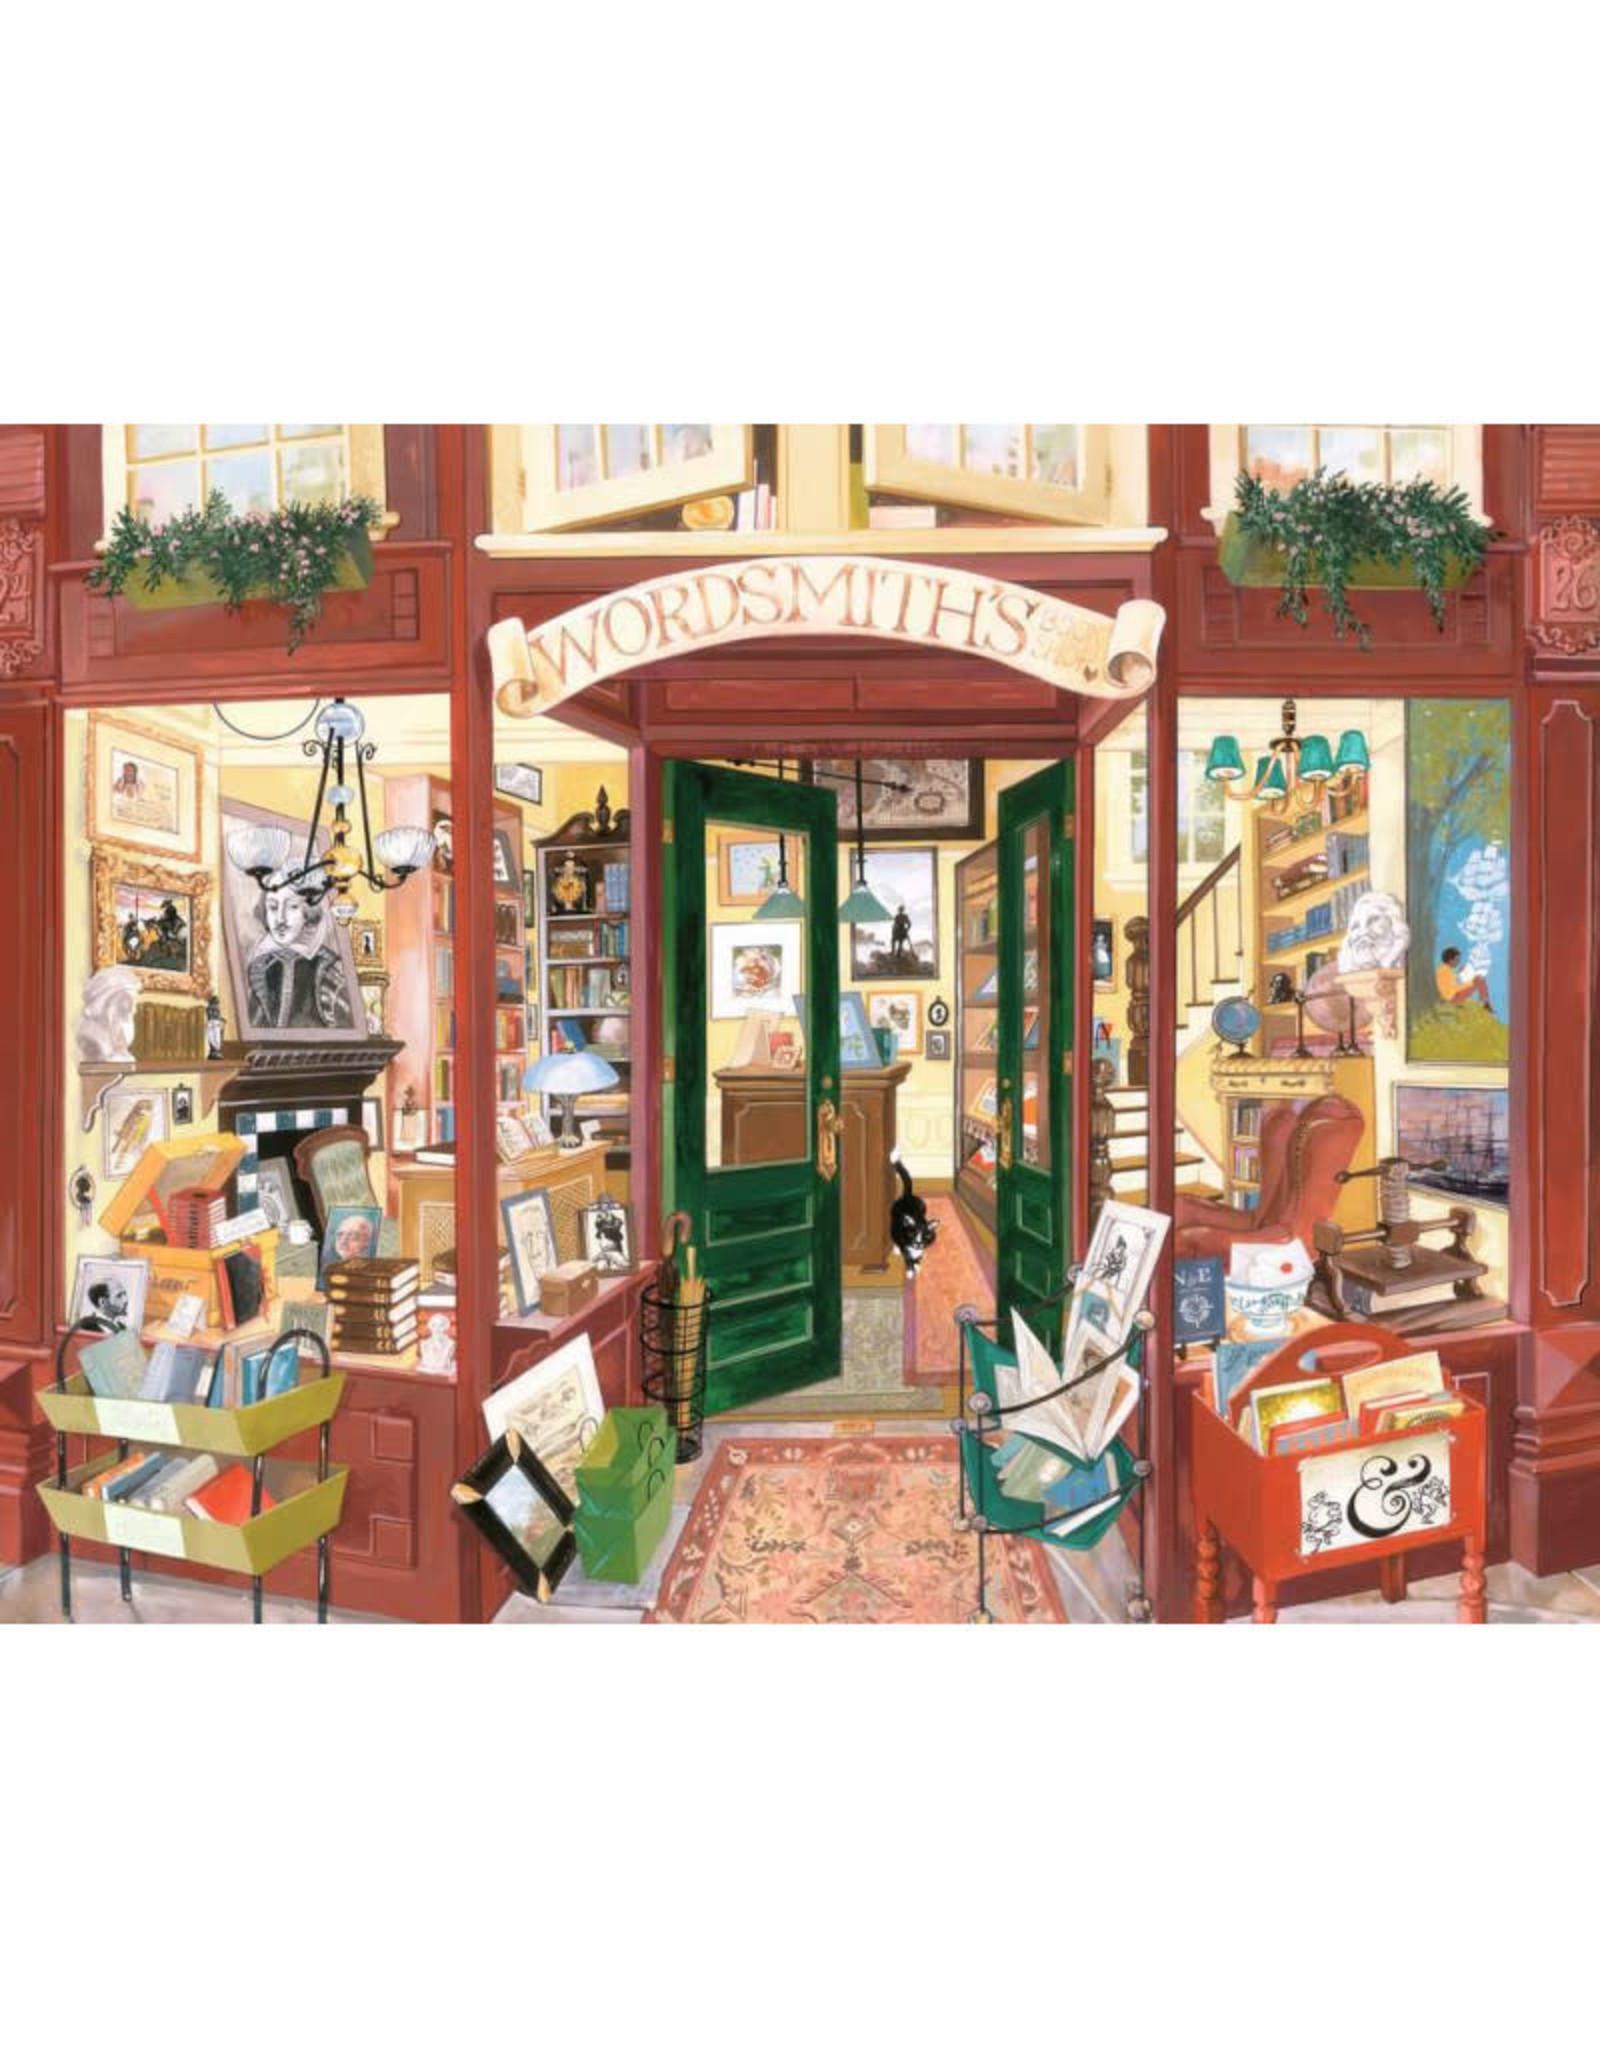 Ravensburger Wordsmith's Bookshop Puzzle 1500 PCS